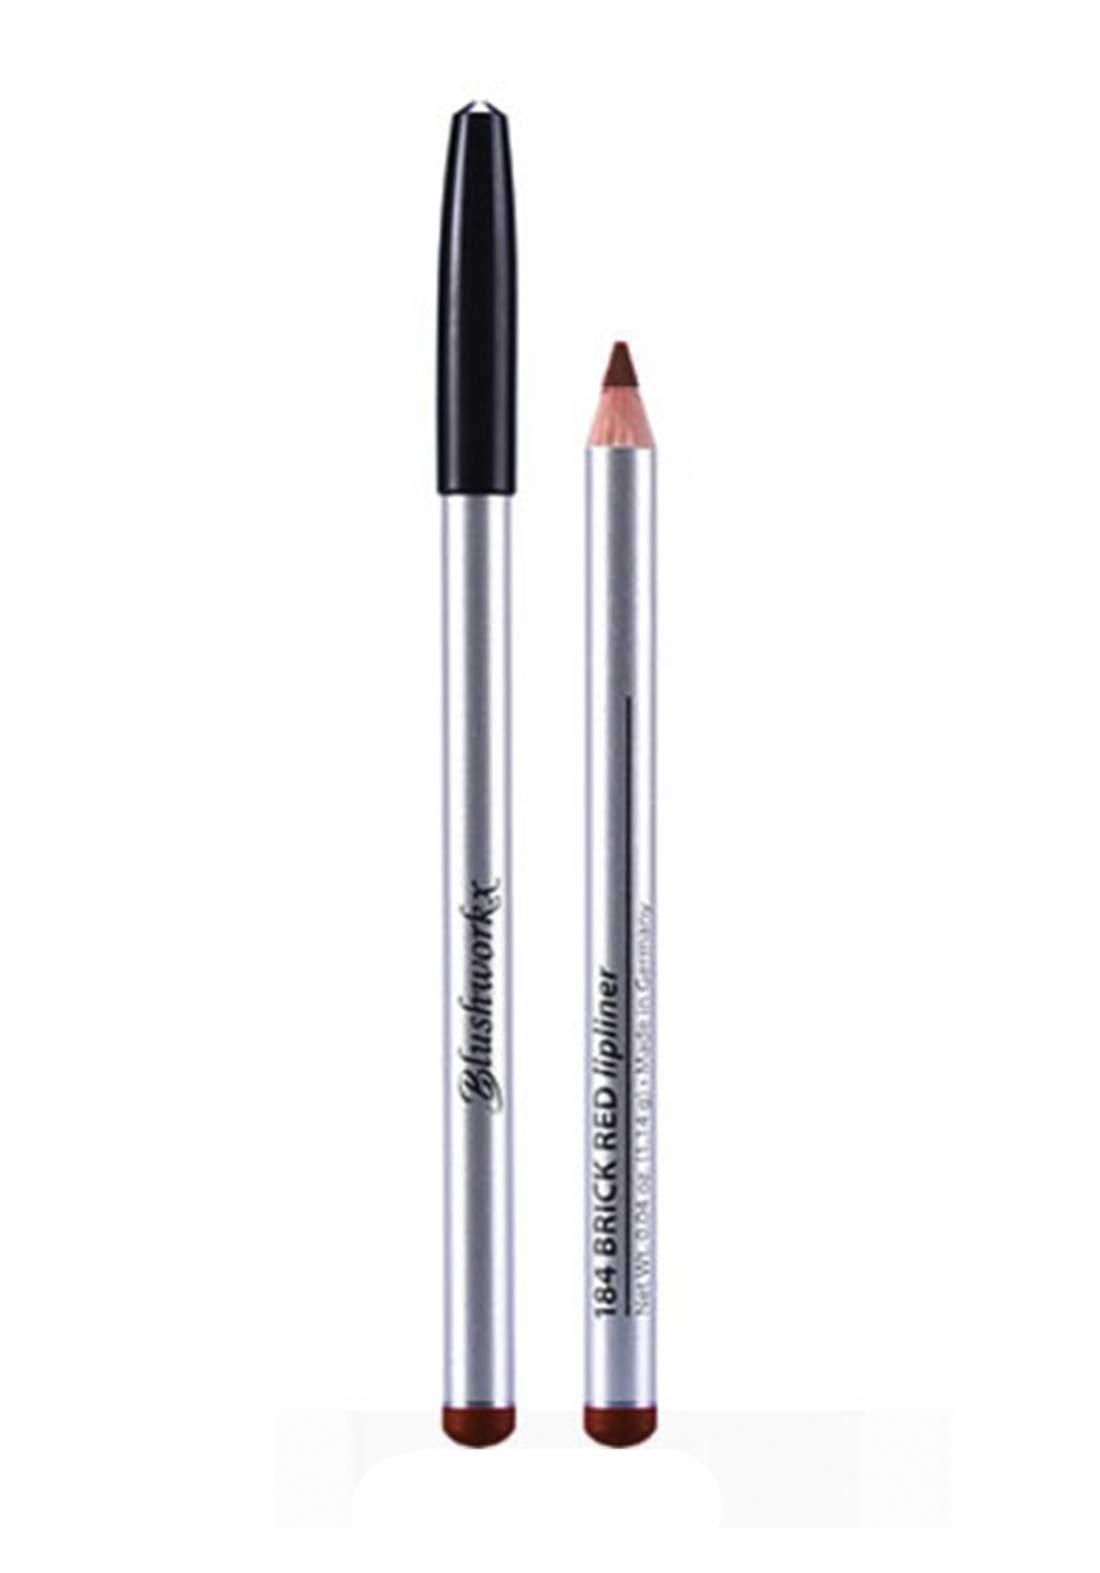 Blushworkx Hollywood Lip Liner Pencil No.180 Warm Brandy 1.14g محدد الشفاه